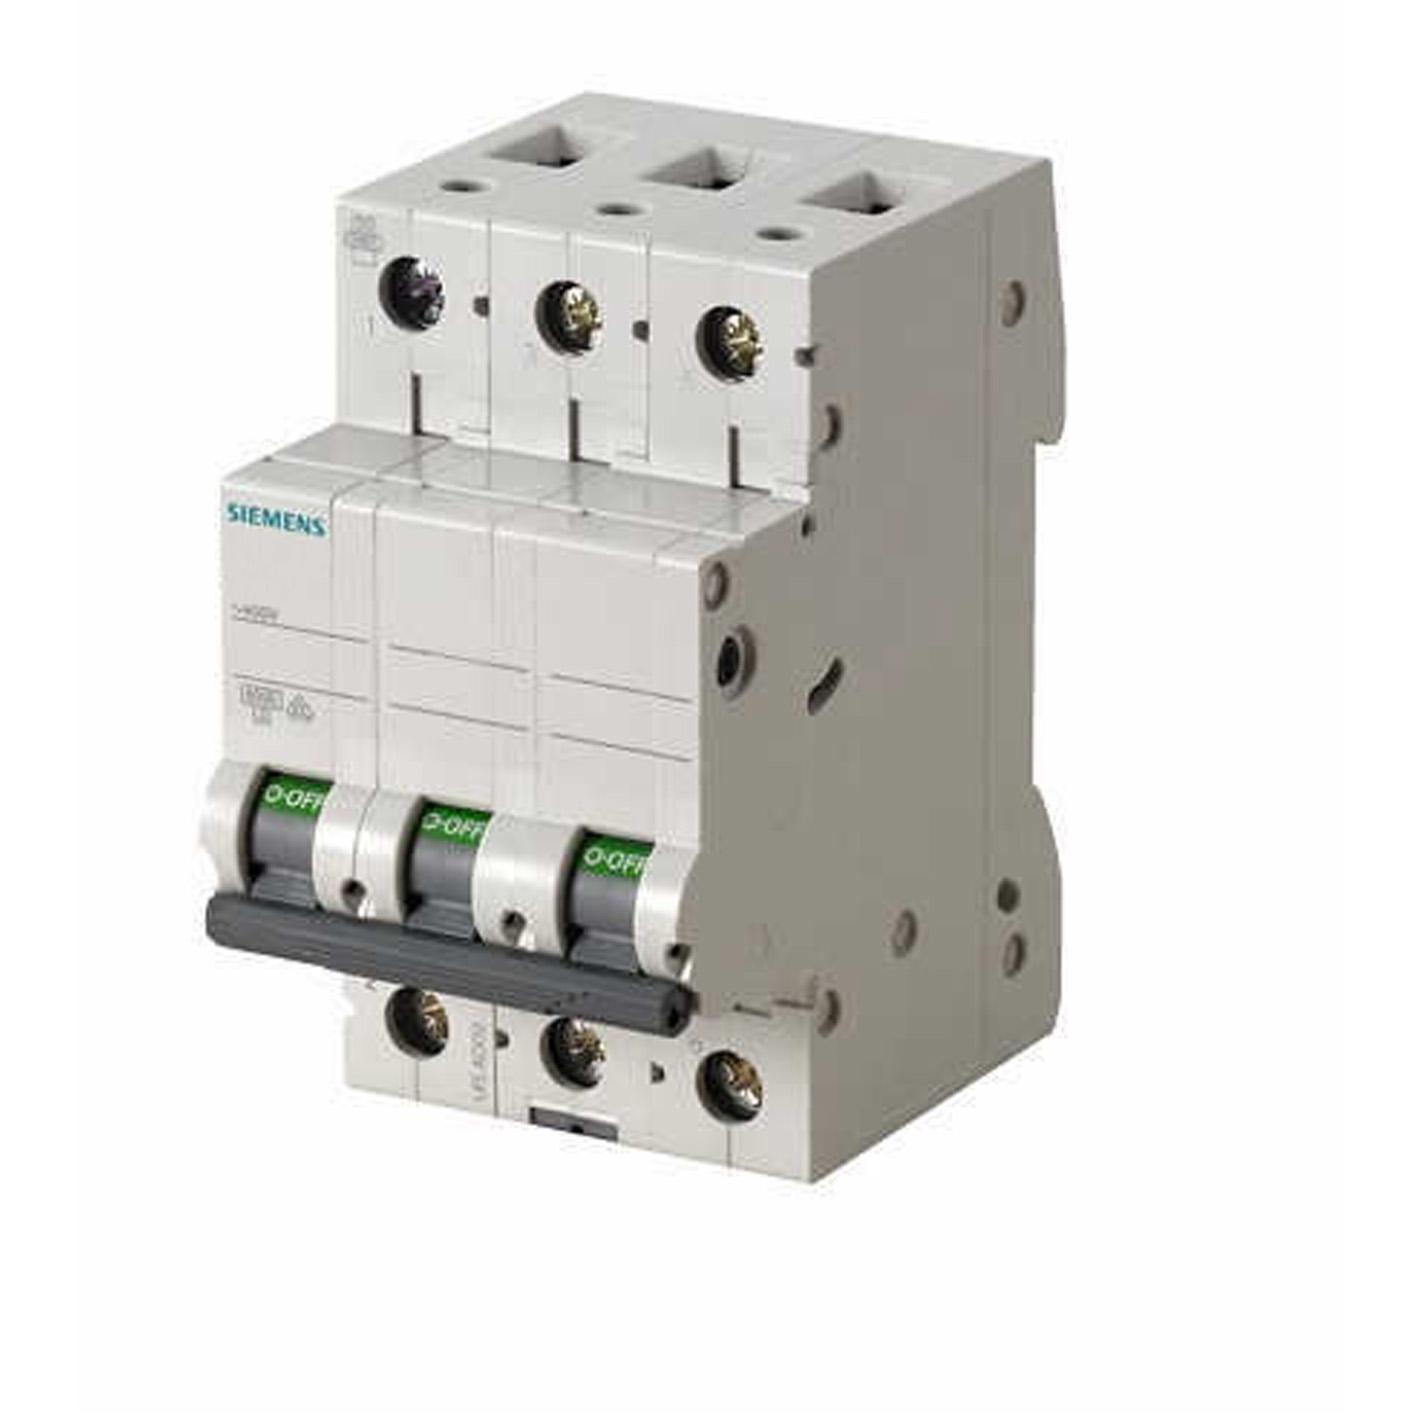 Siemens 3x20A Otomatik Sigorta